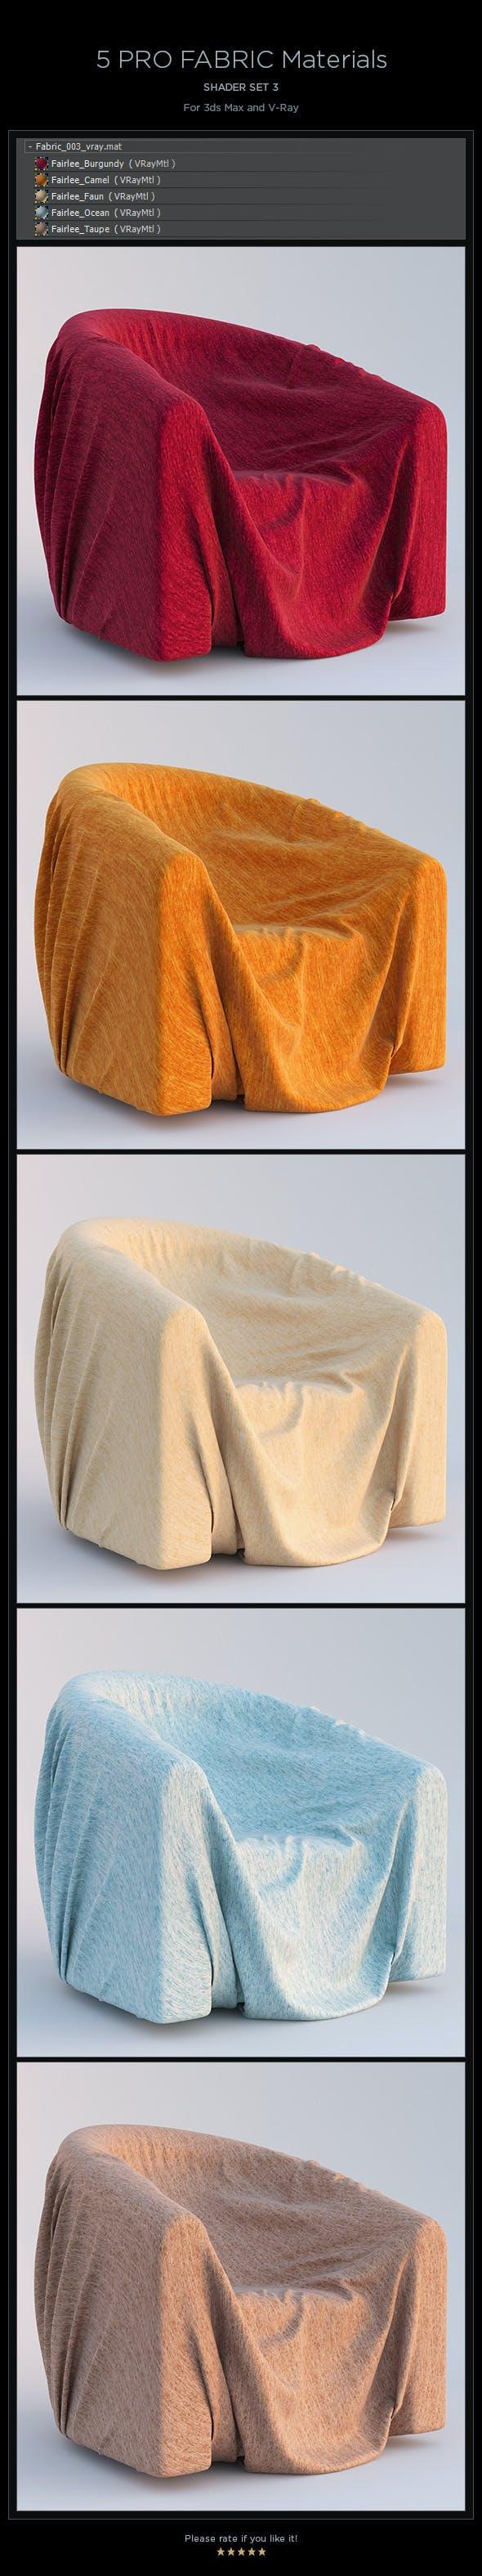 5 Pro Fabric Materials - set 3 - 3DOcean Item for Sale